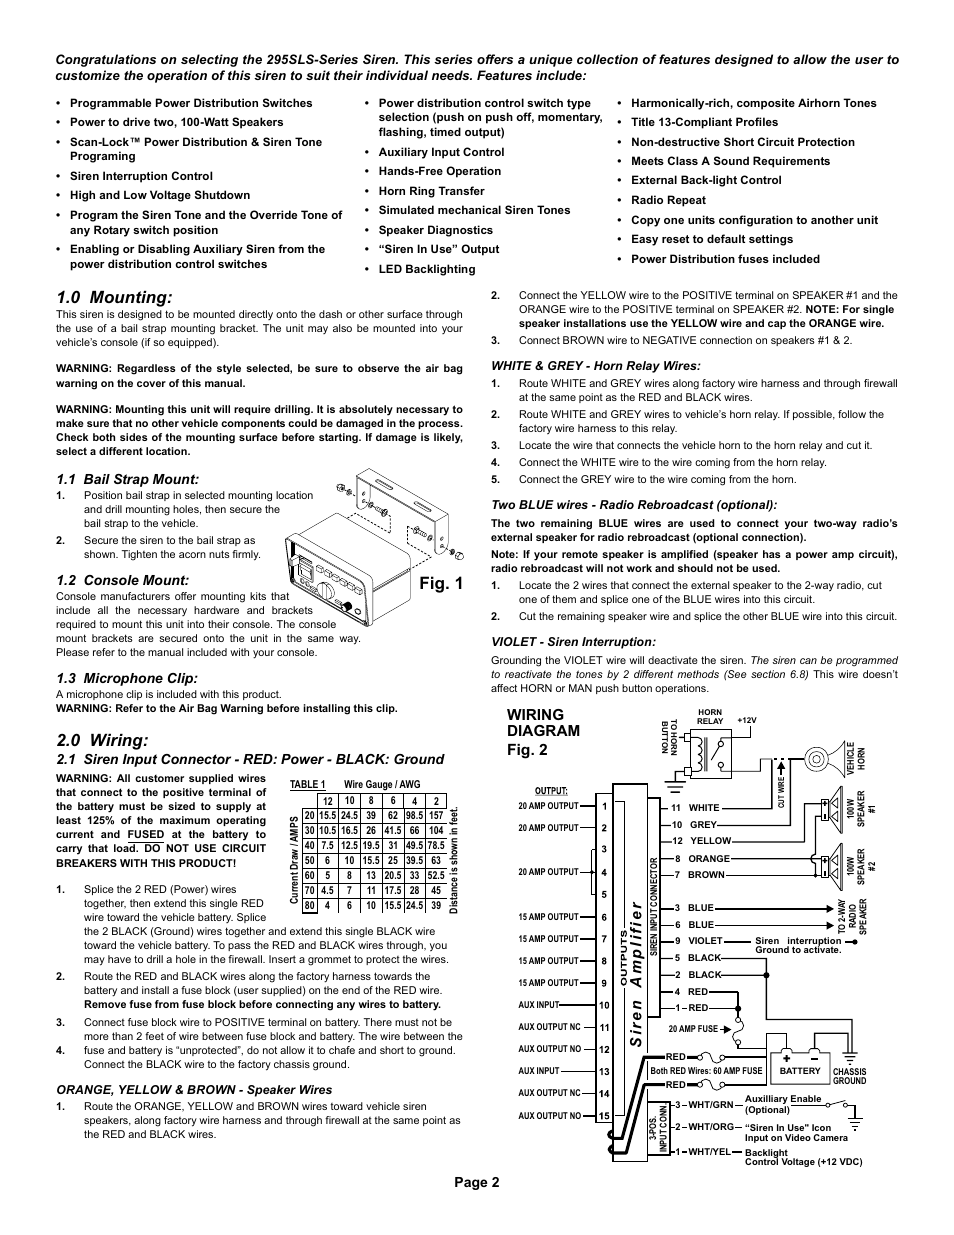 Whelen Cencom Sapphire Wiring Diagram